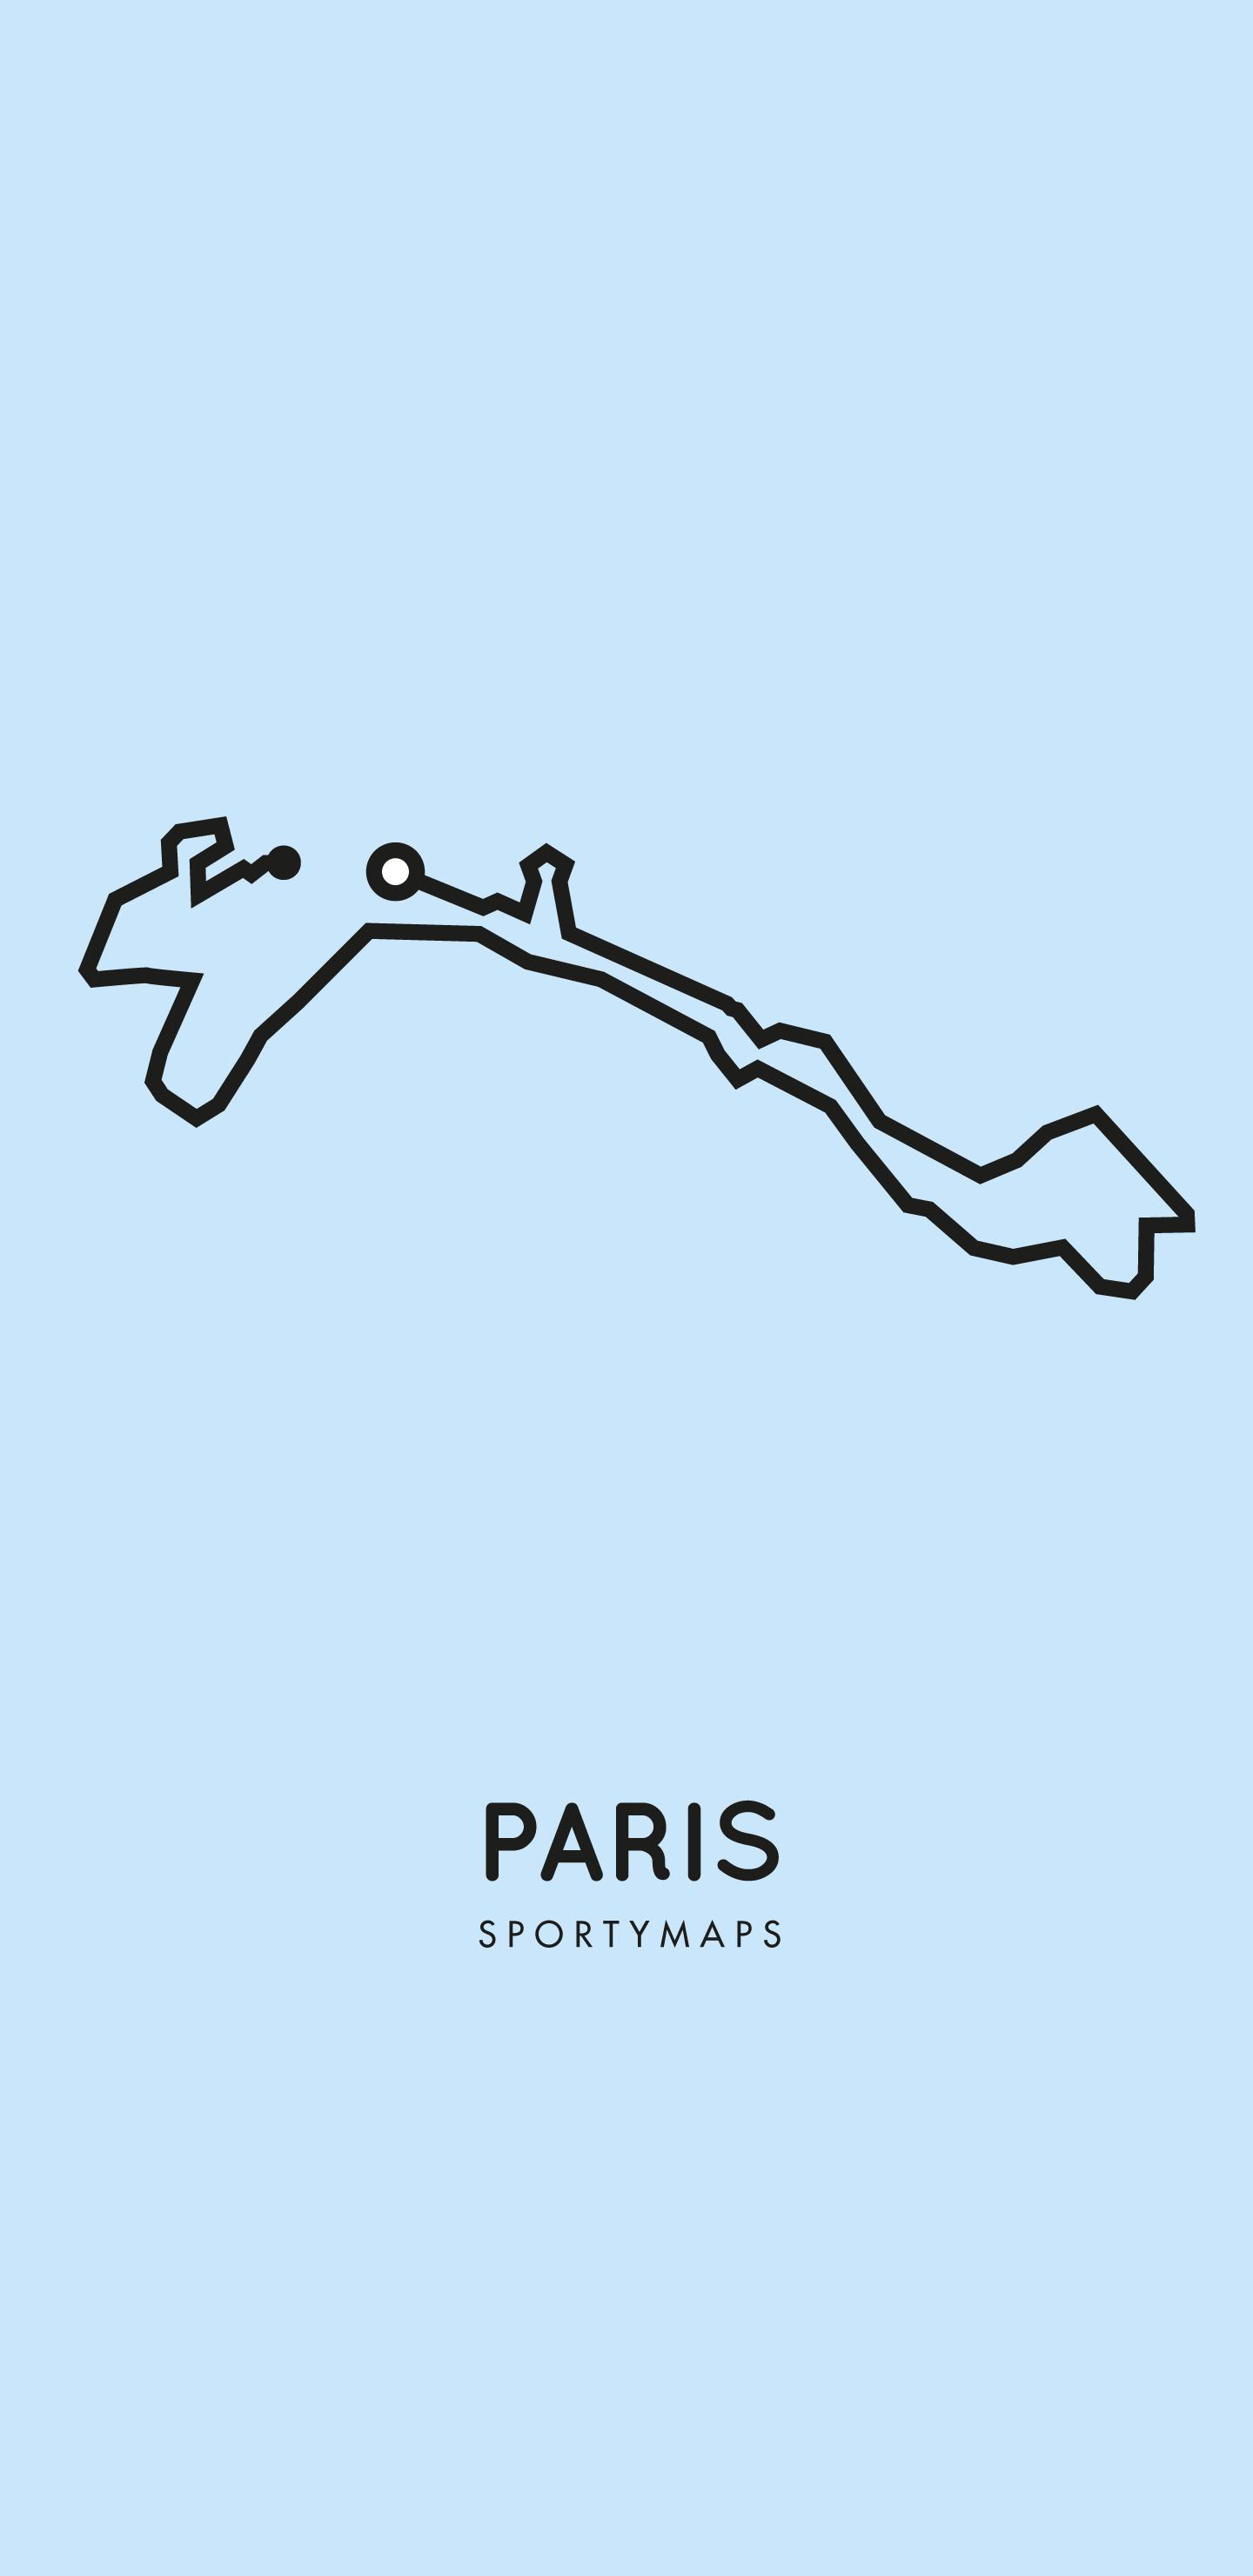 Sportymaps-Paris-marathon-blue